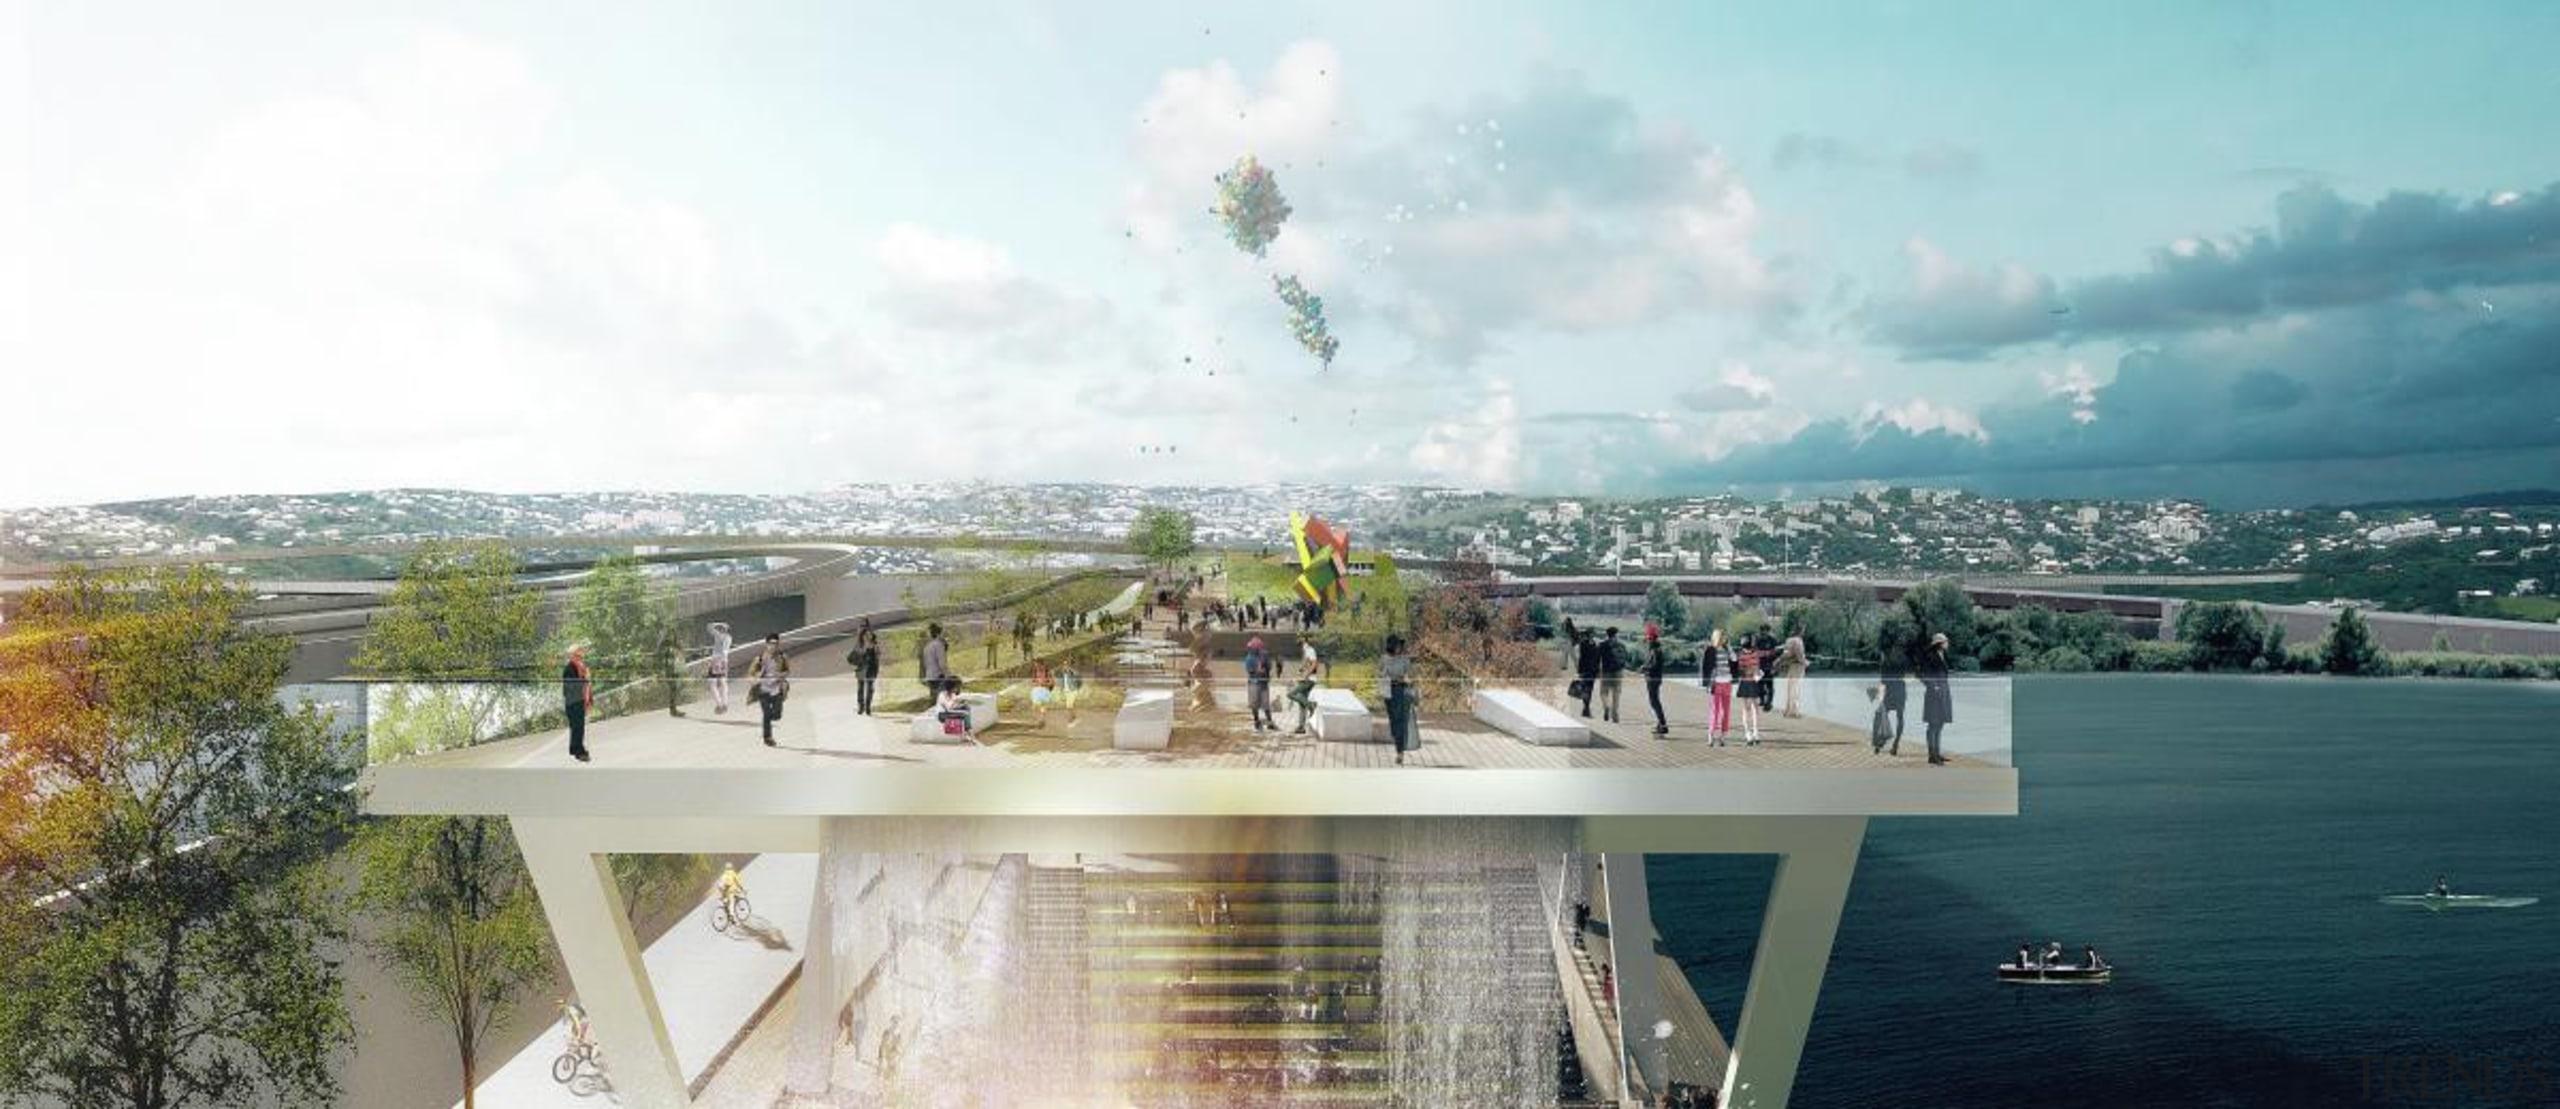 High line park - High line park - architecture, city, real estate, sky, tourist attraction, white